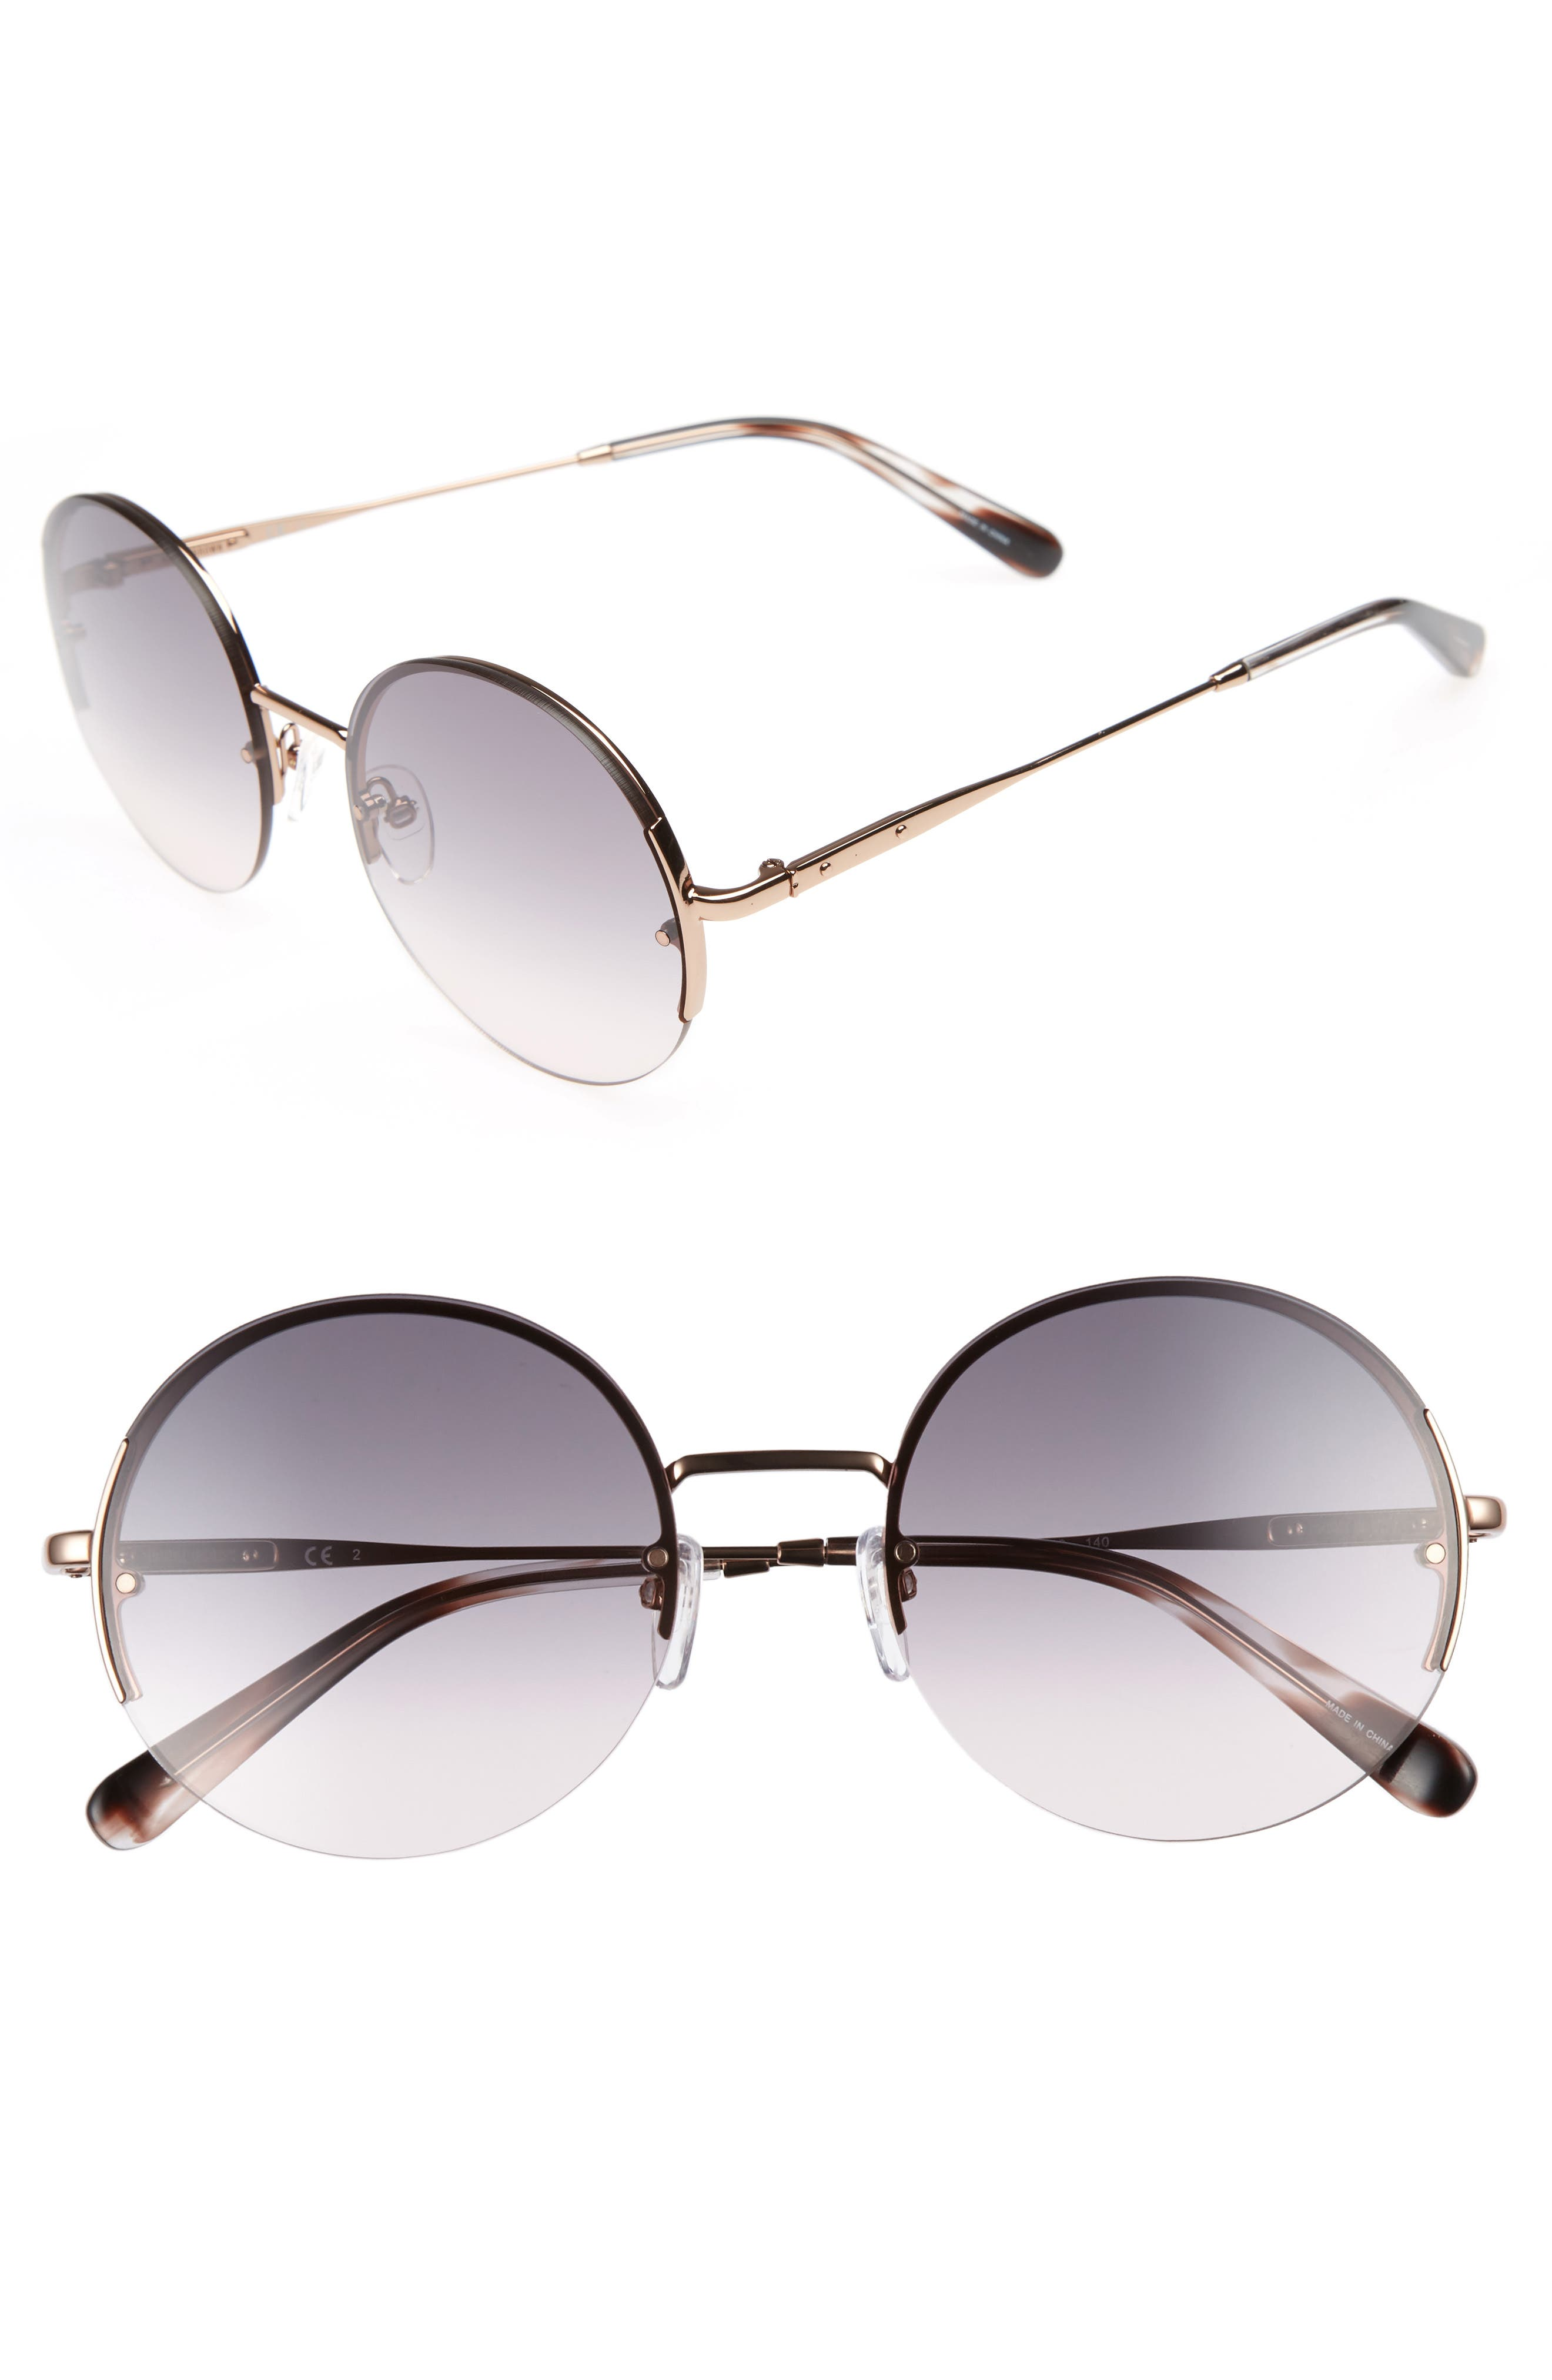 Bobbi Brown 55mm Round Sunglasses